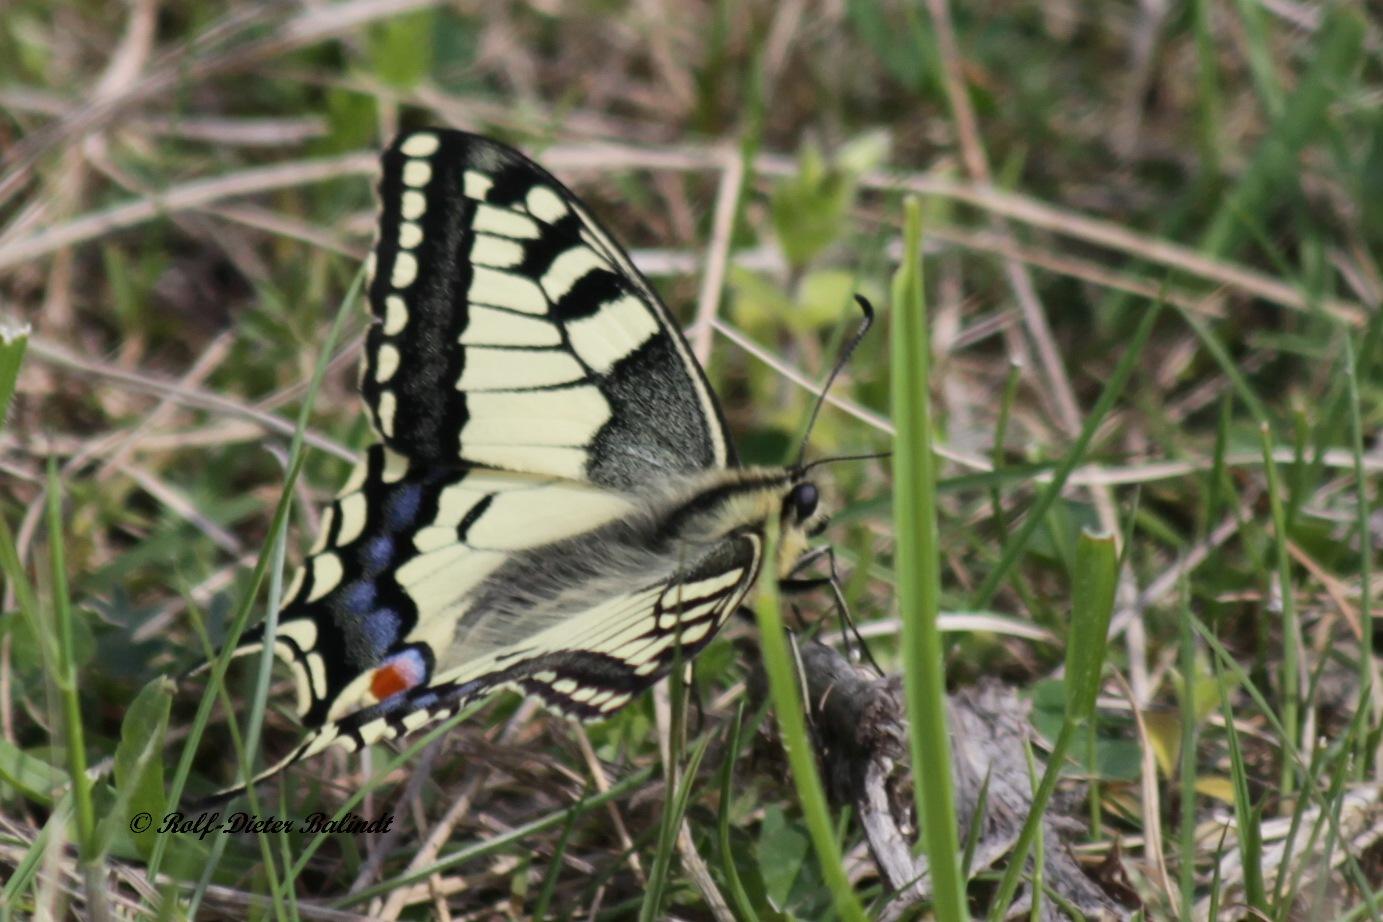 Schmetterling / Butterfly by Rolf-Dieter Balindt